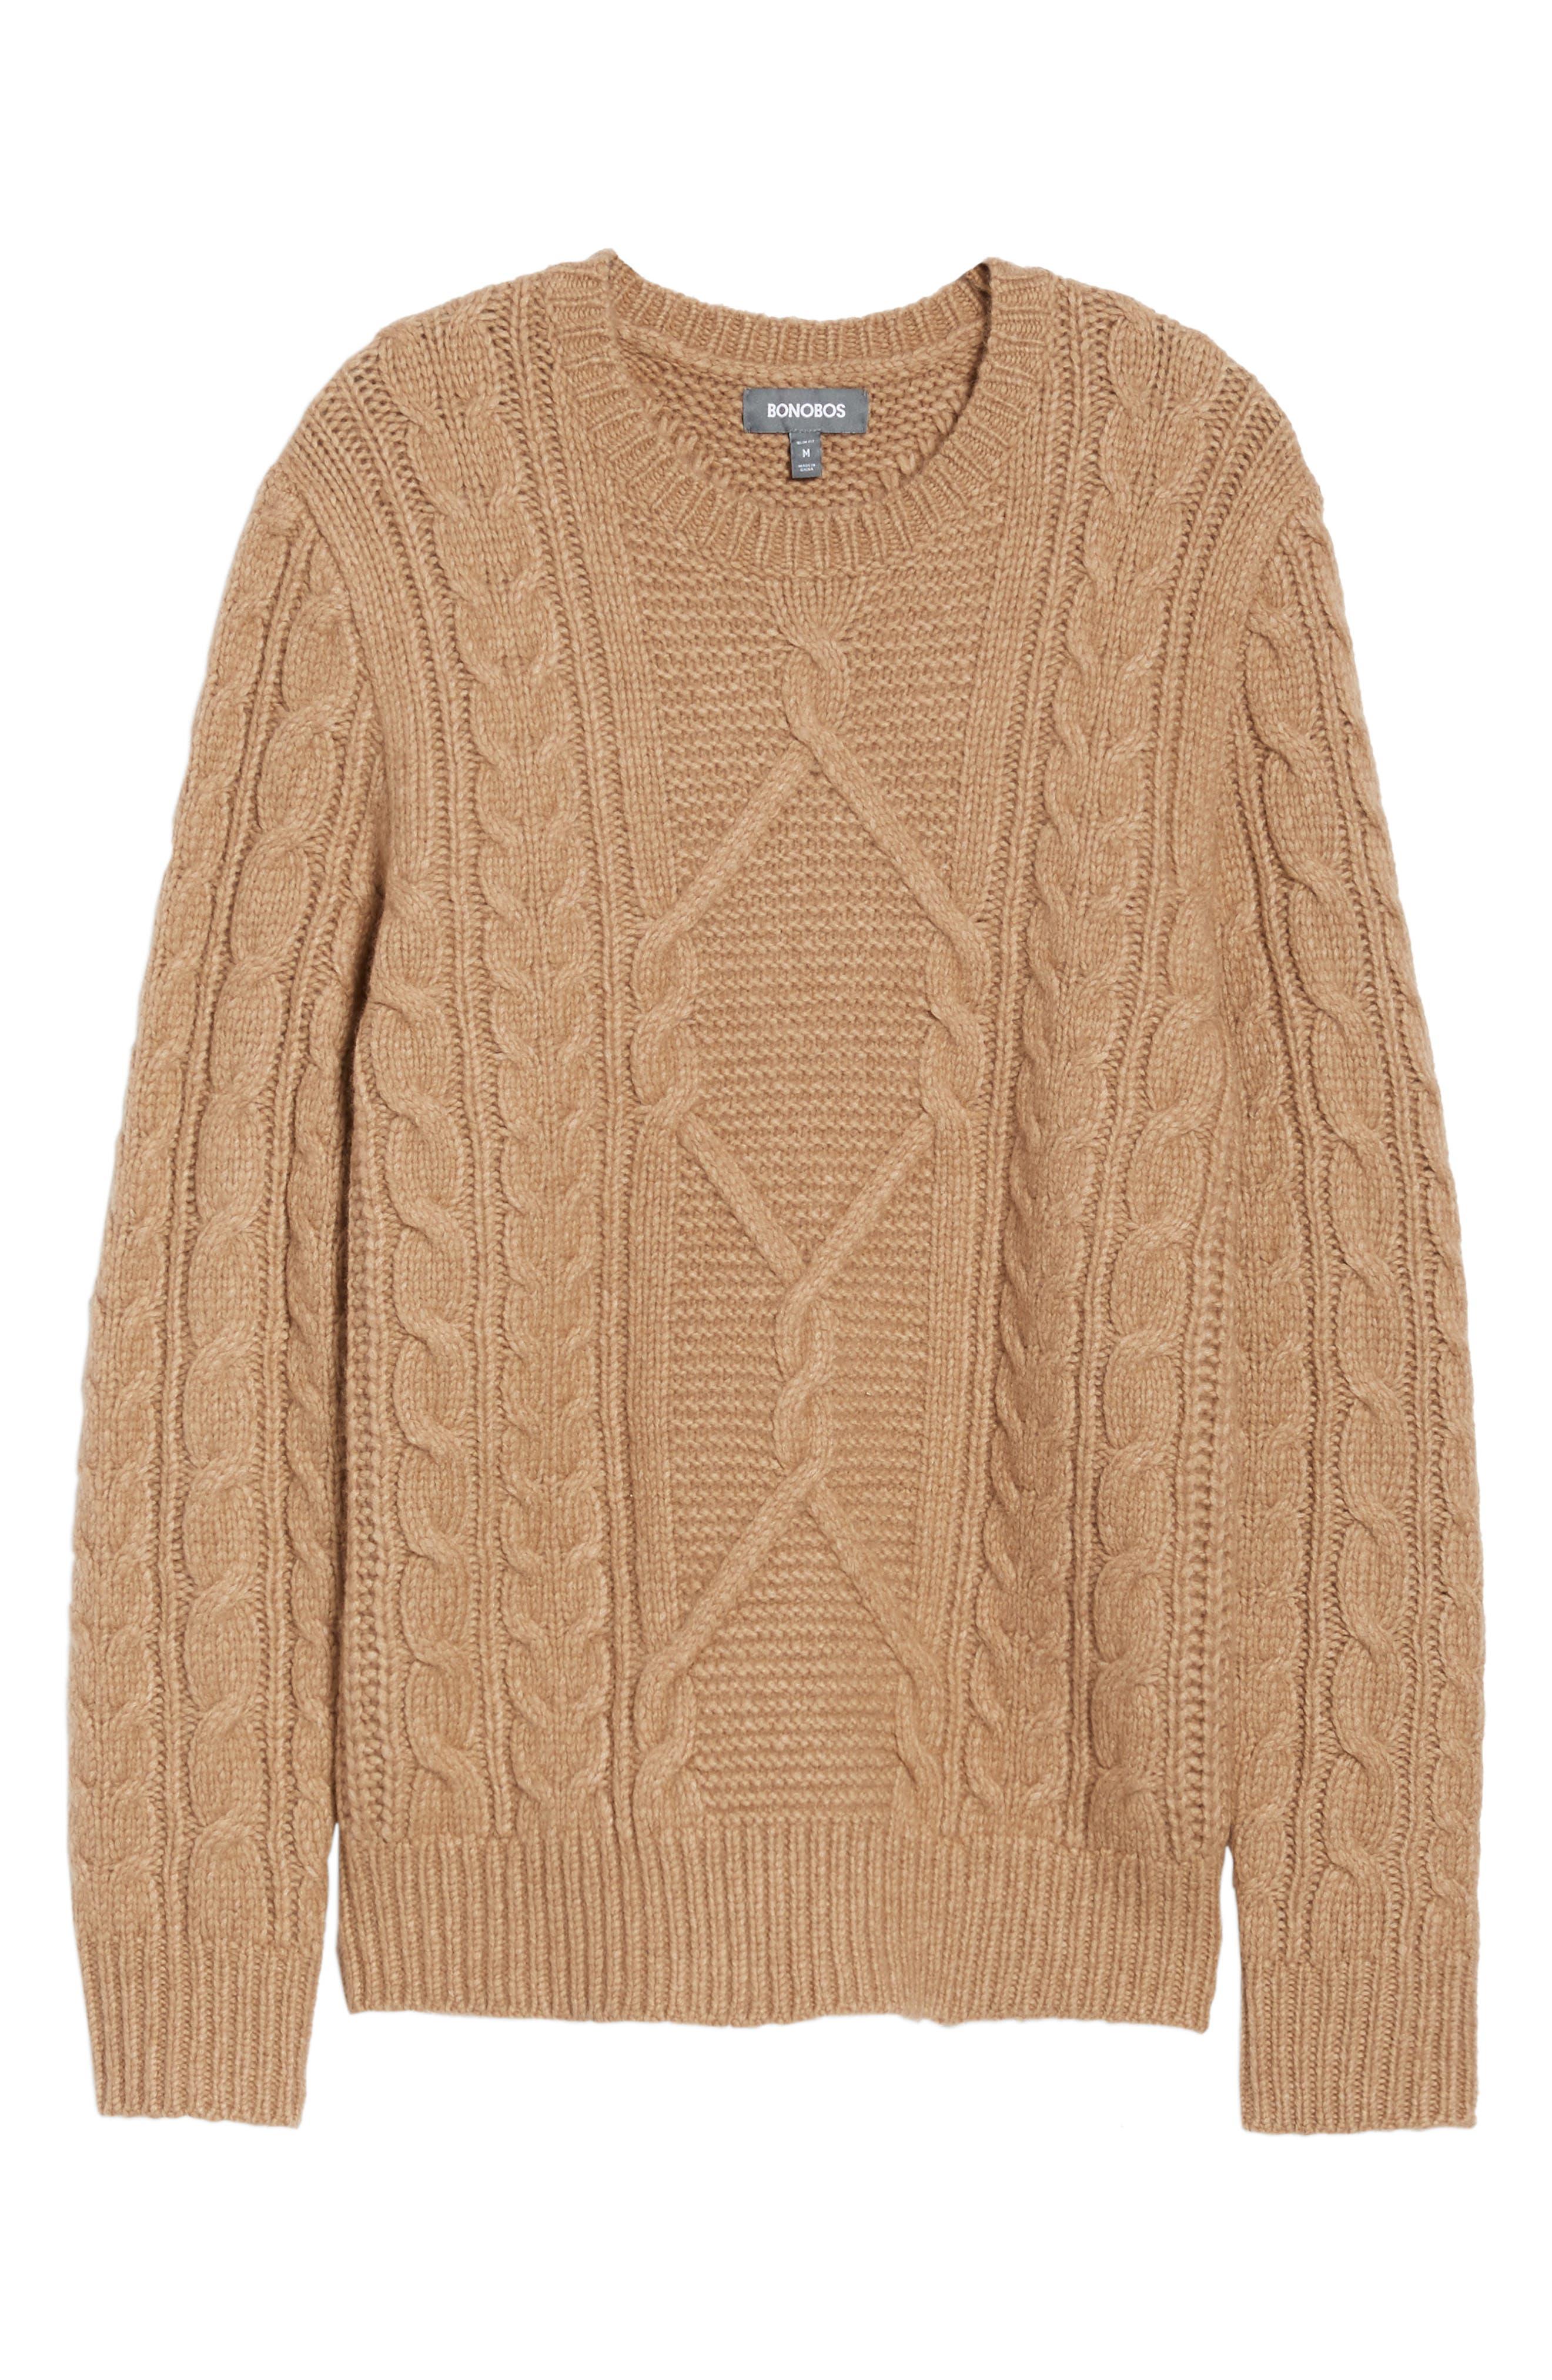 Cable Knit Crewneck Sweater,                             Alternate thumbnail 6, color,                             Camel